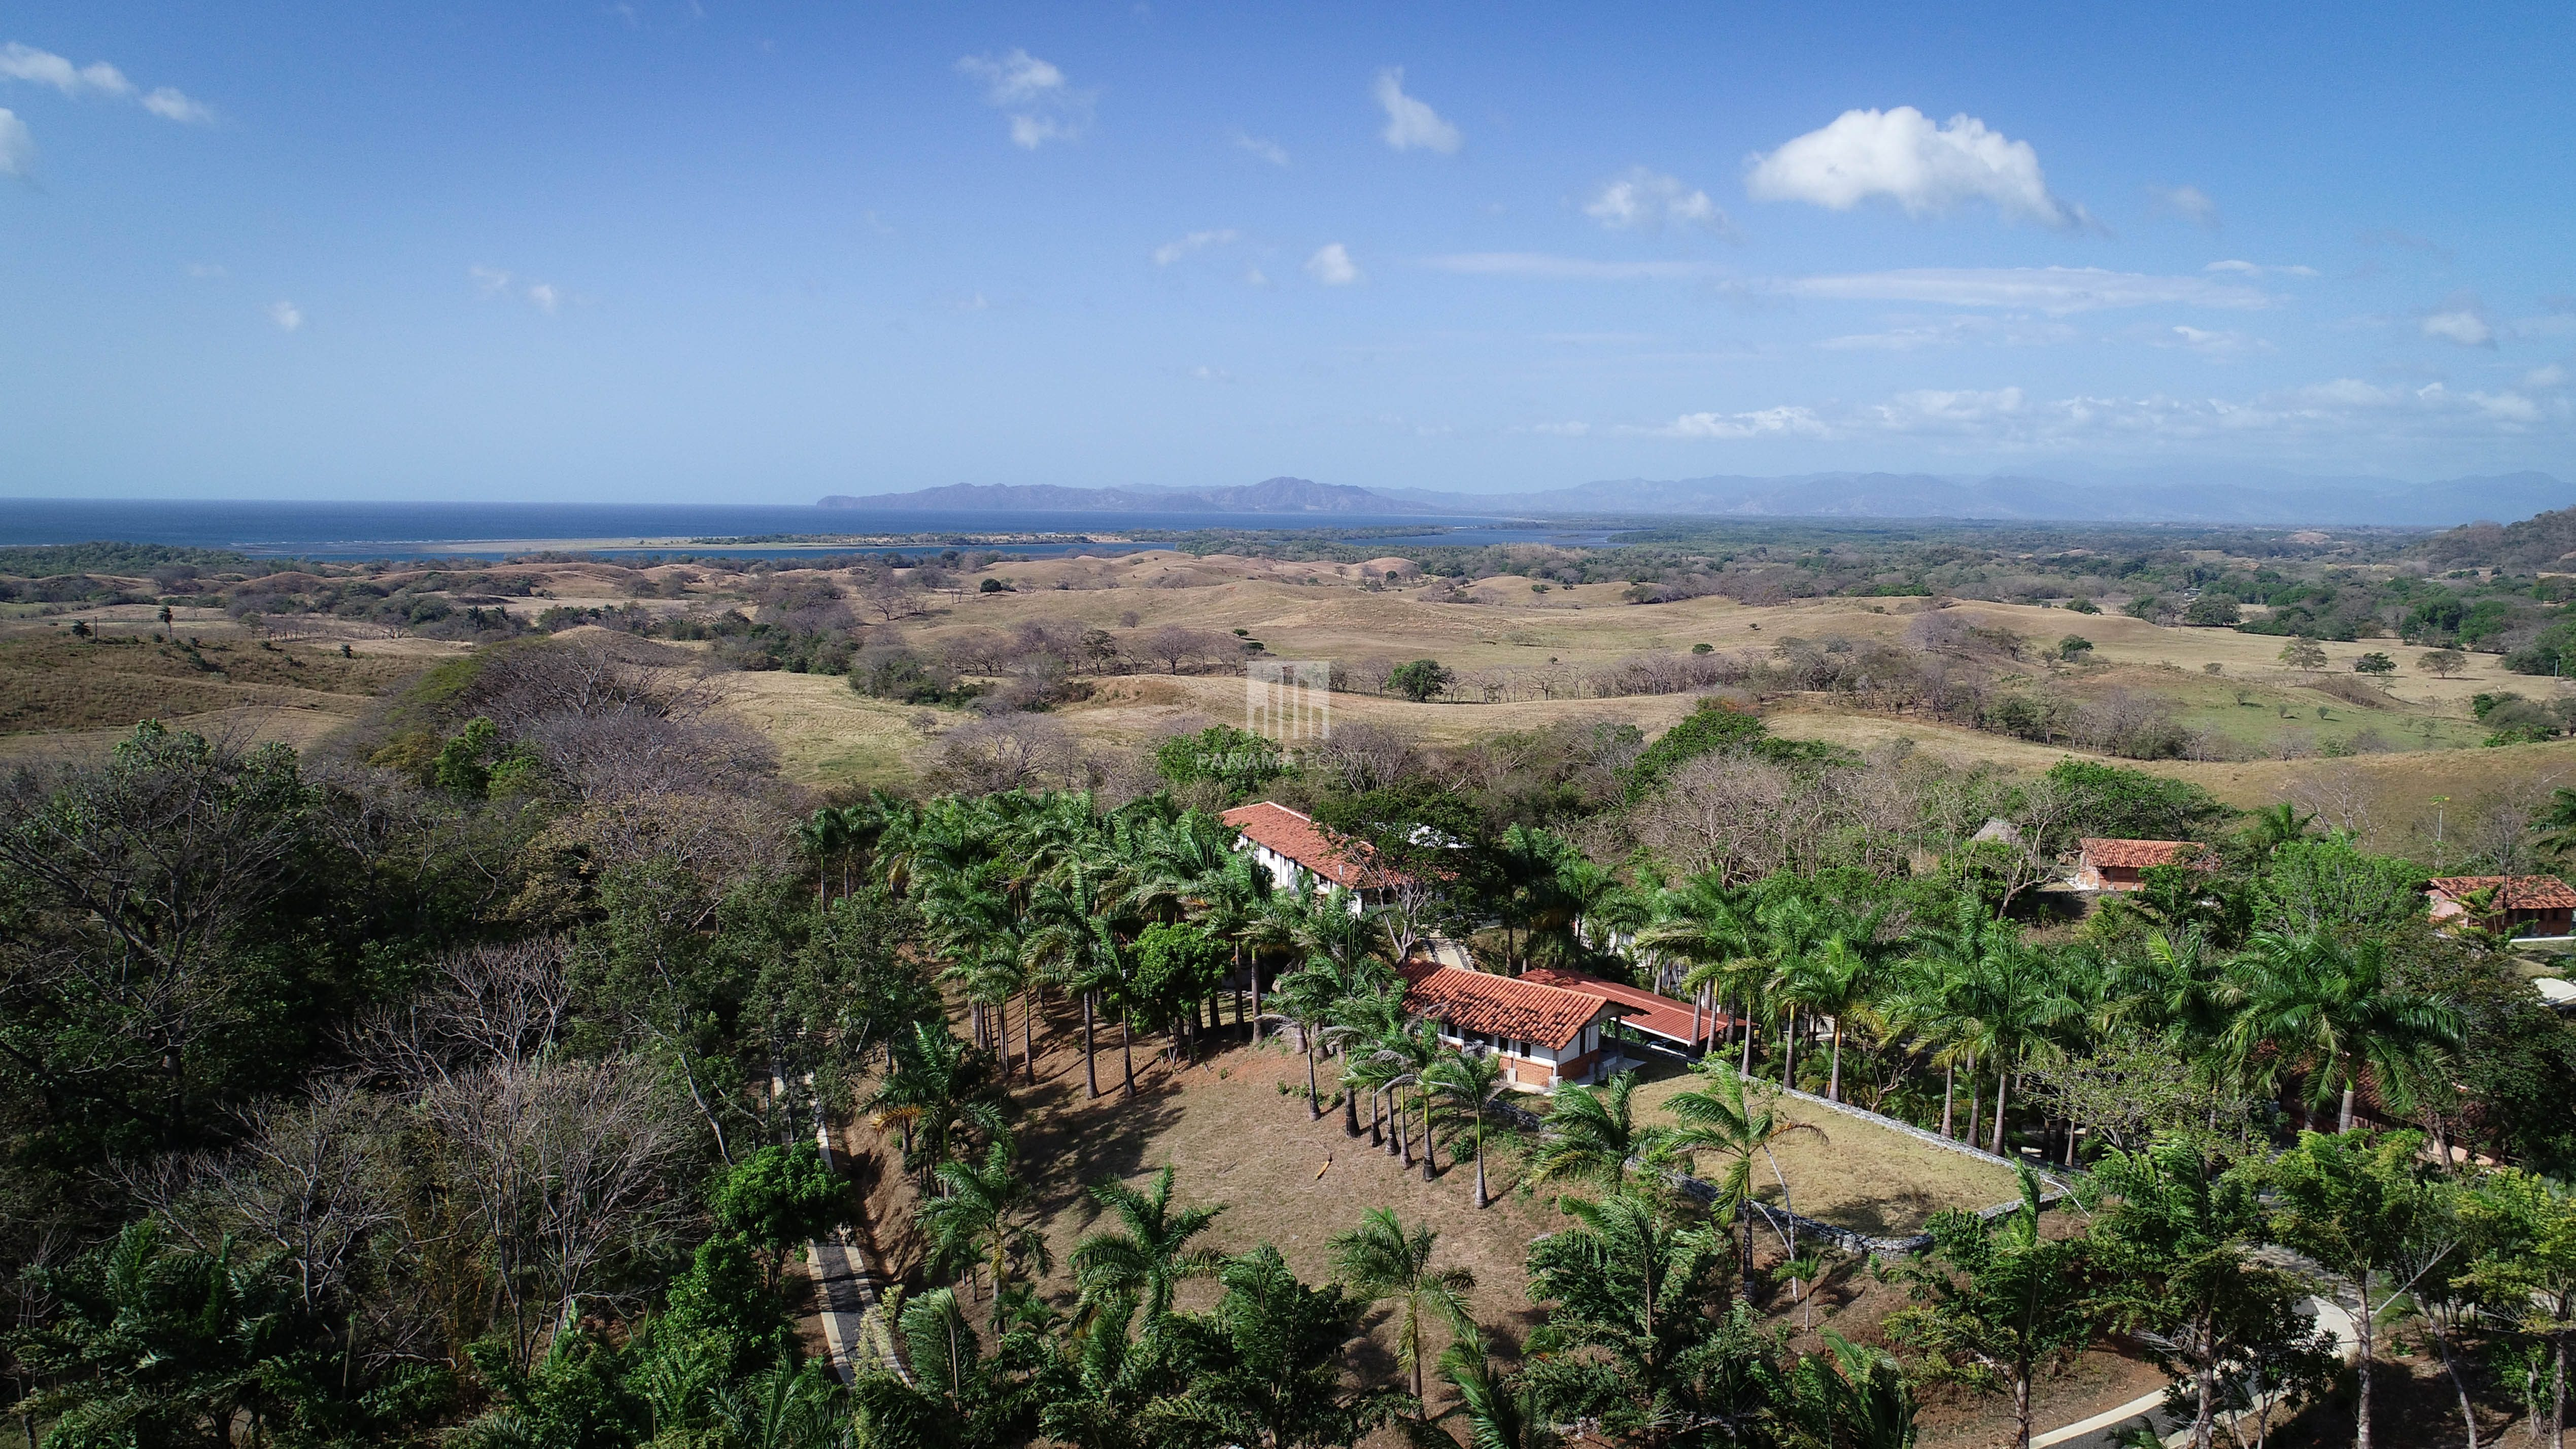 Kanyini Ocean Views – Unique Ocean View Estate/Hotel